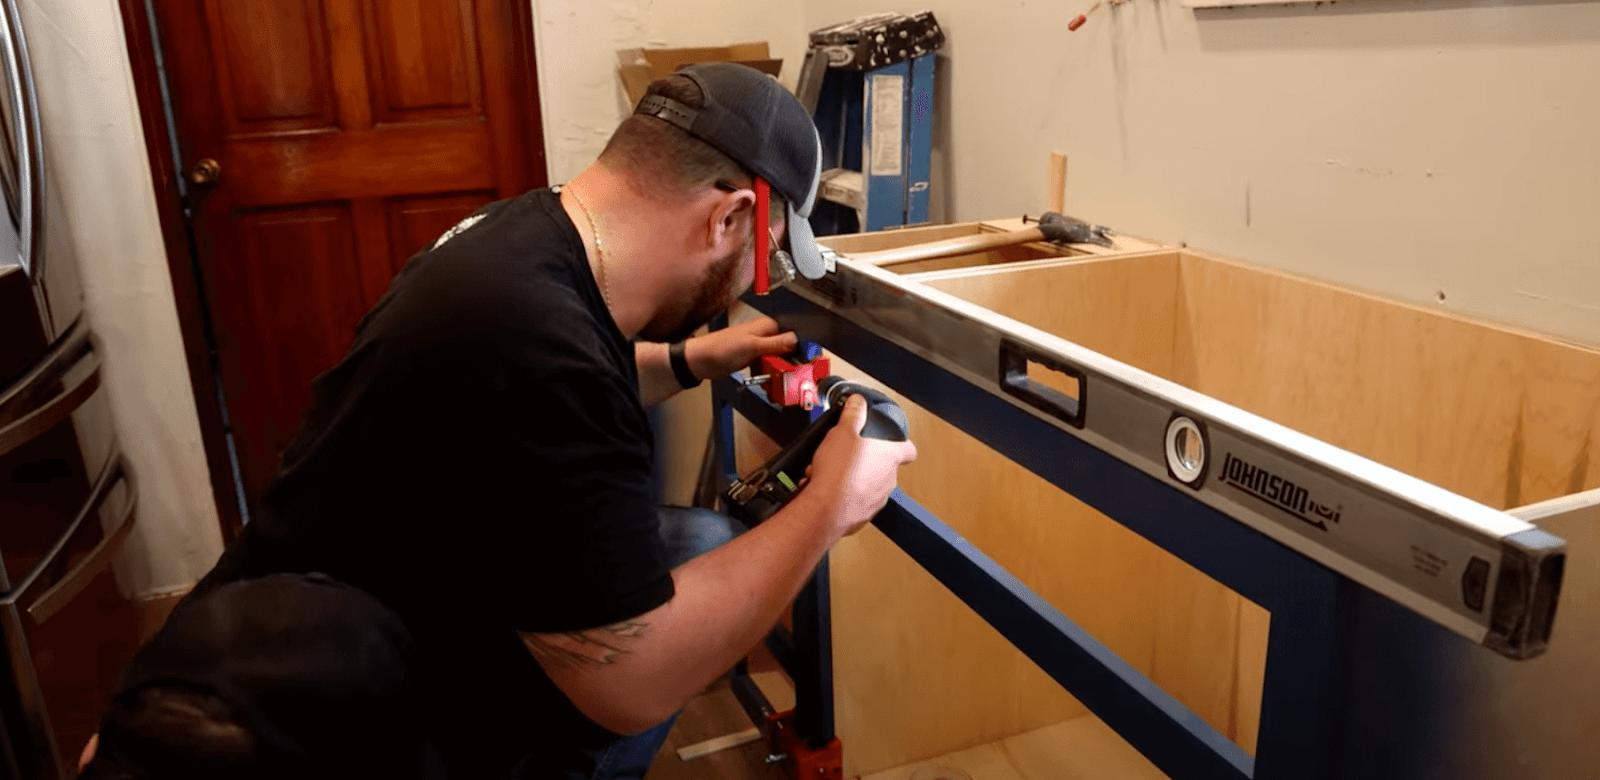 John Malecki working on a cabinet